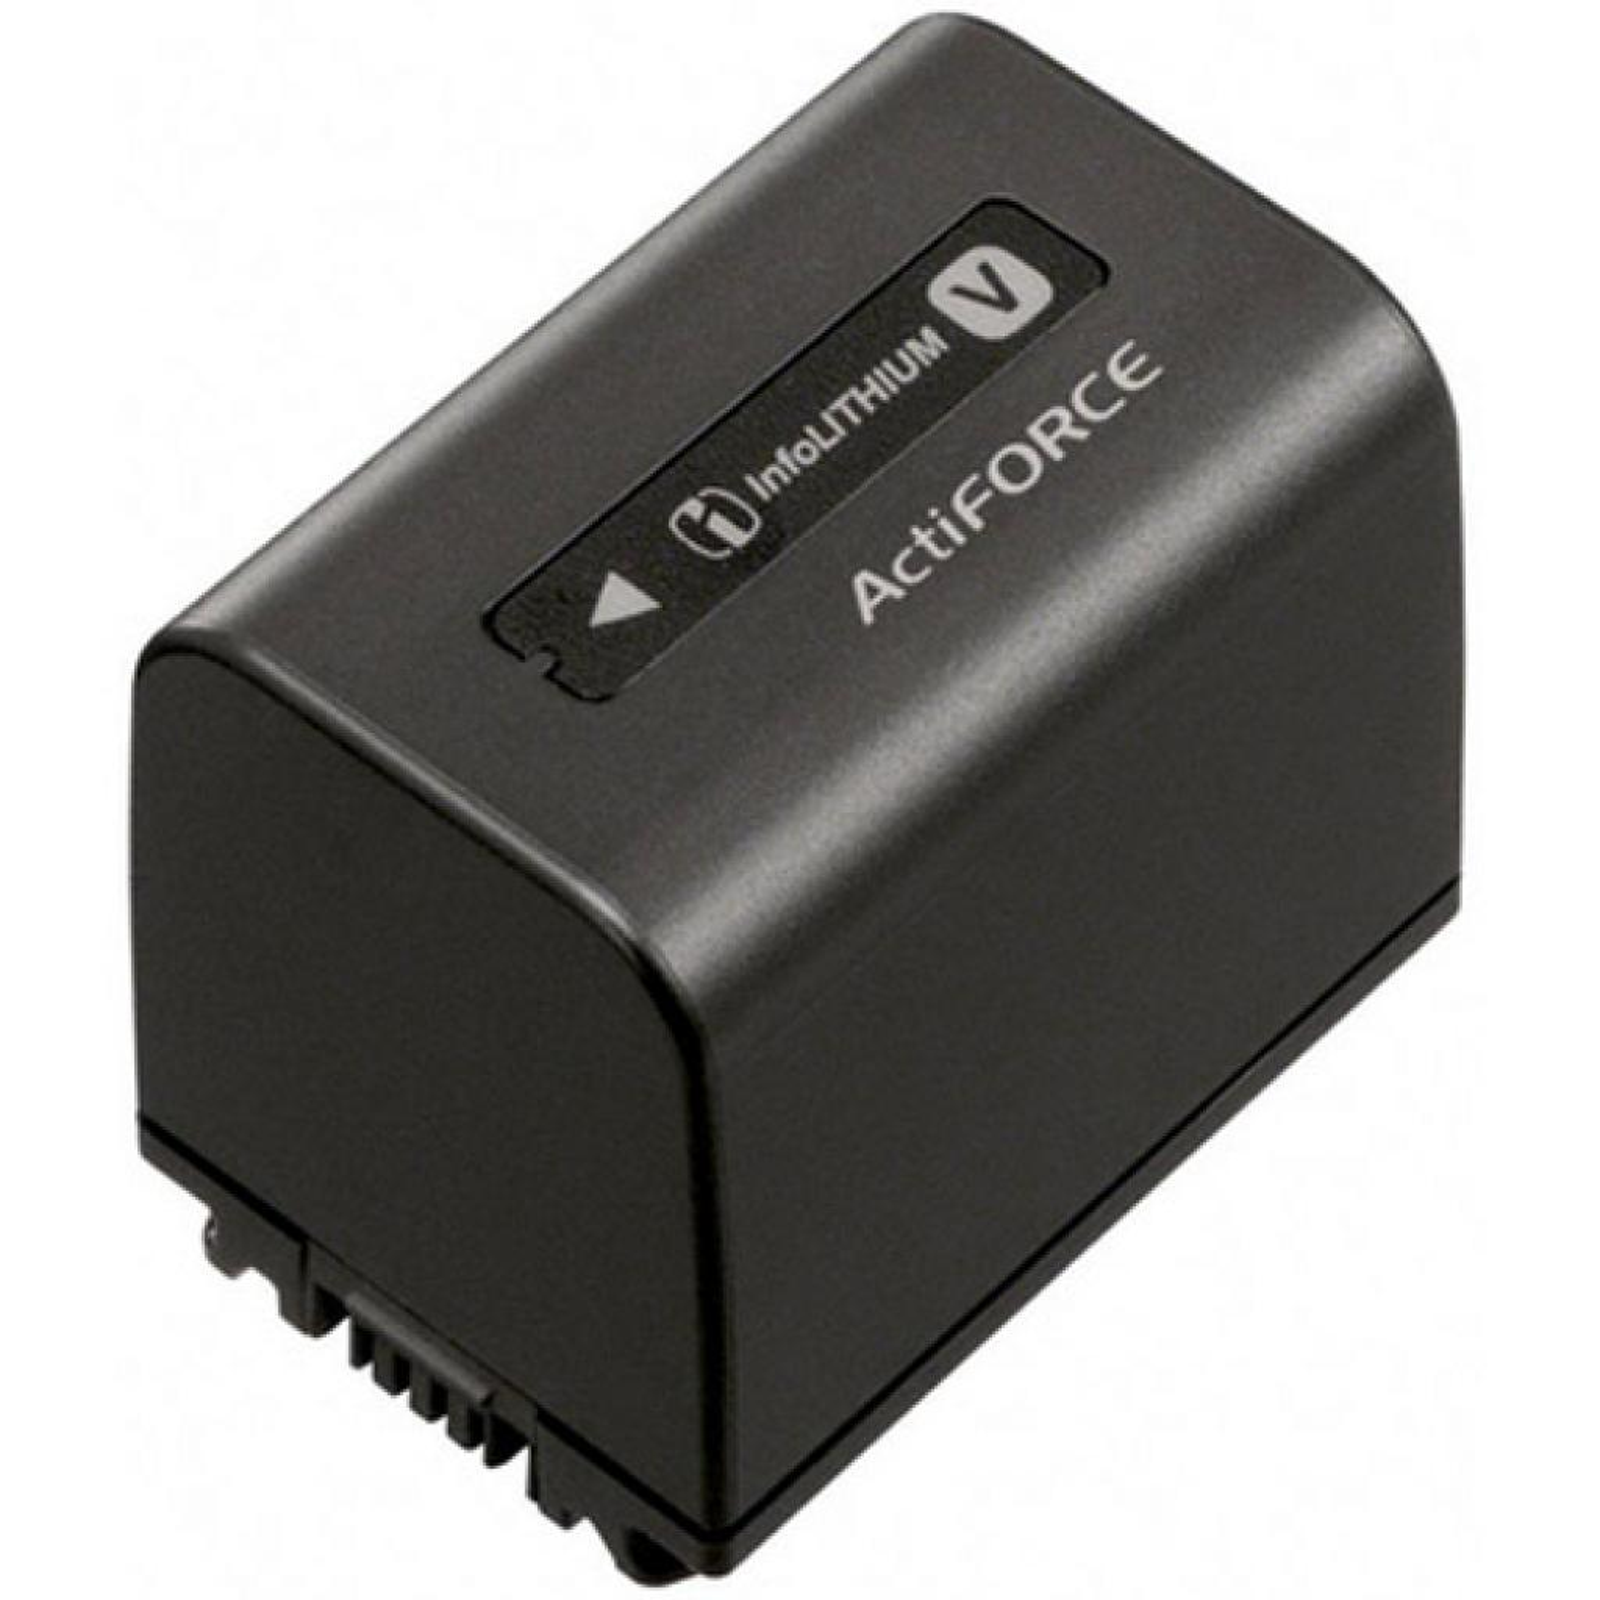 Аккумулятор к фото/видео Sony NP-FV70 PowerPlant (DV00DV1272) изображение 2